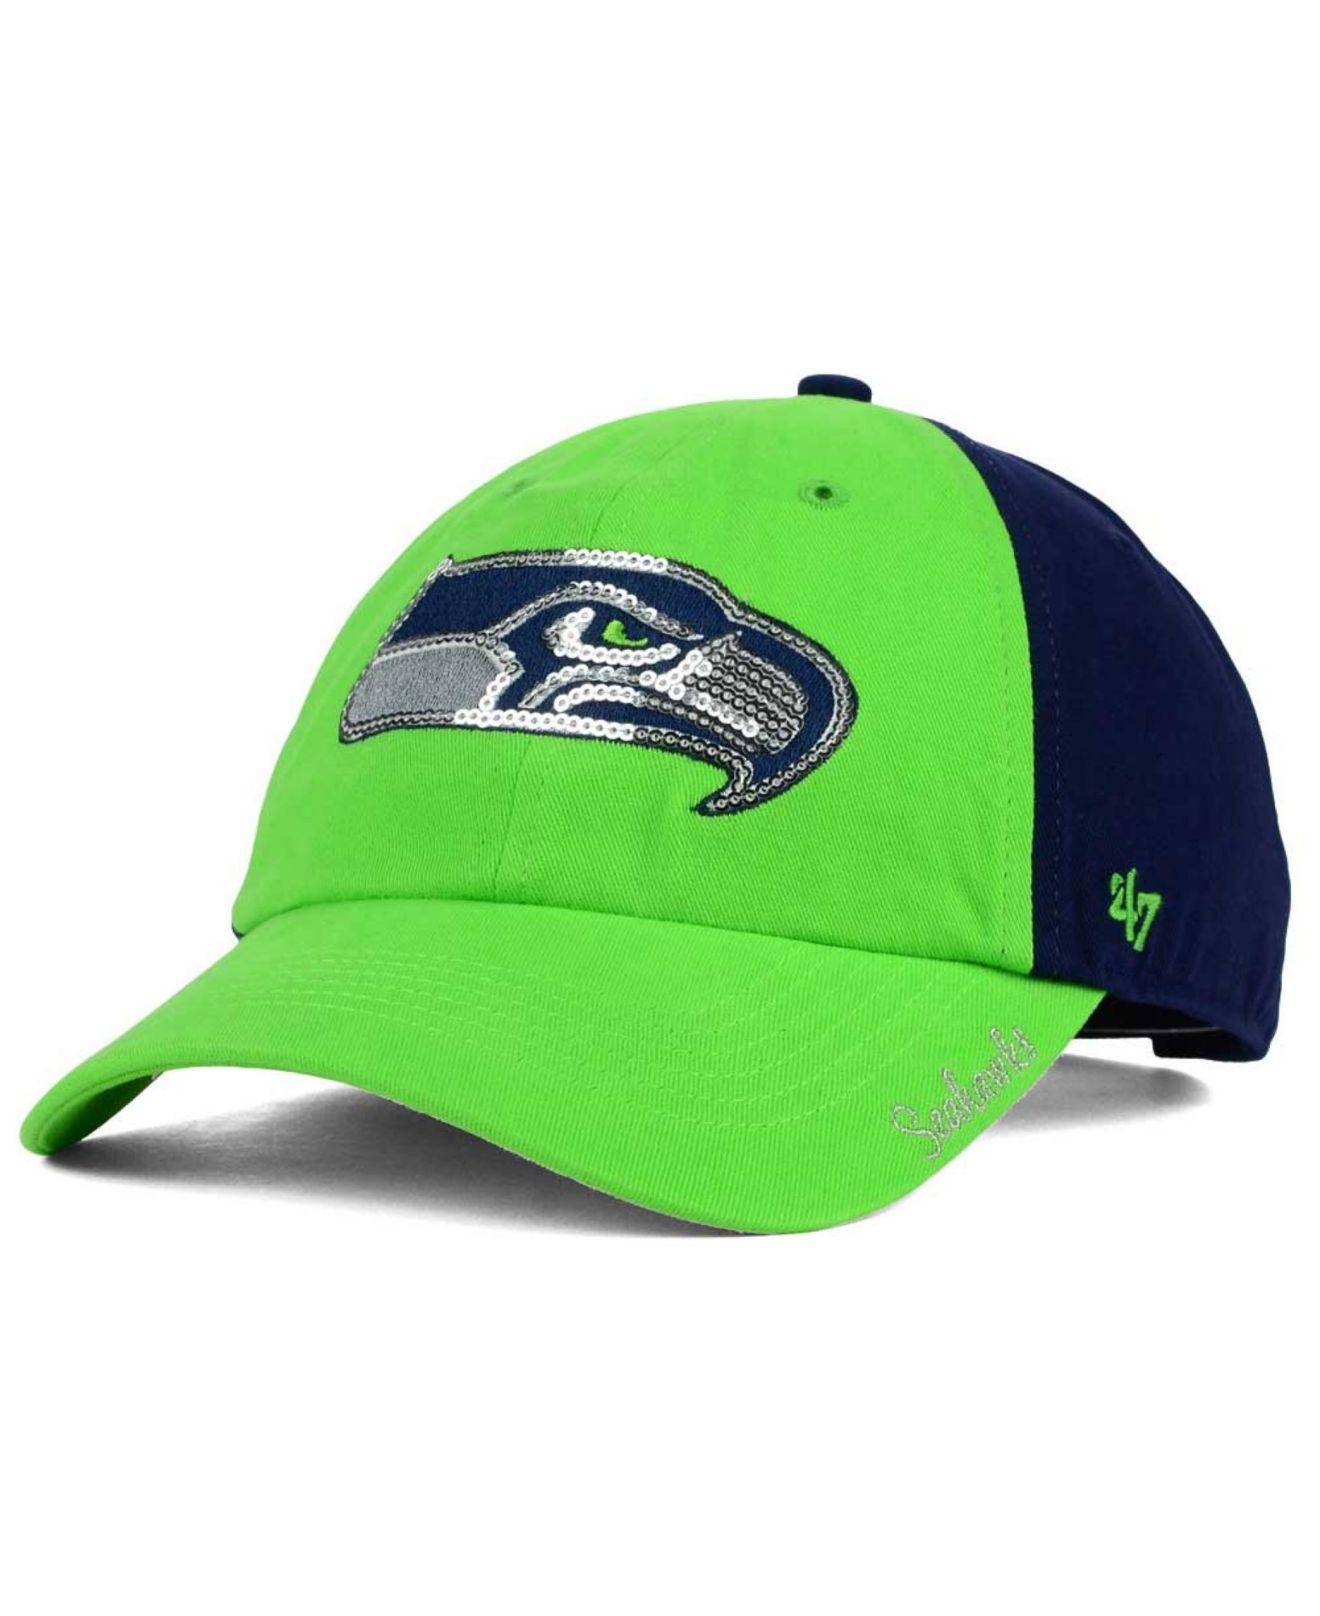 half off 38003 9d903 47 Brand Women s Seattle Seahawks Sparkle 2-tone Adjustable Cap in ...